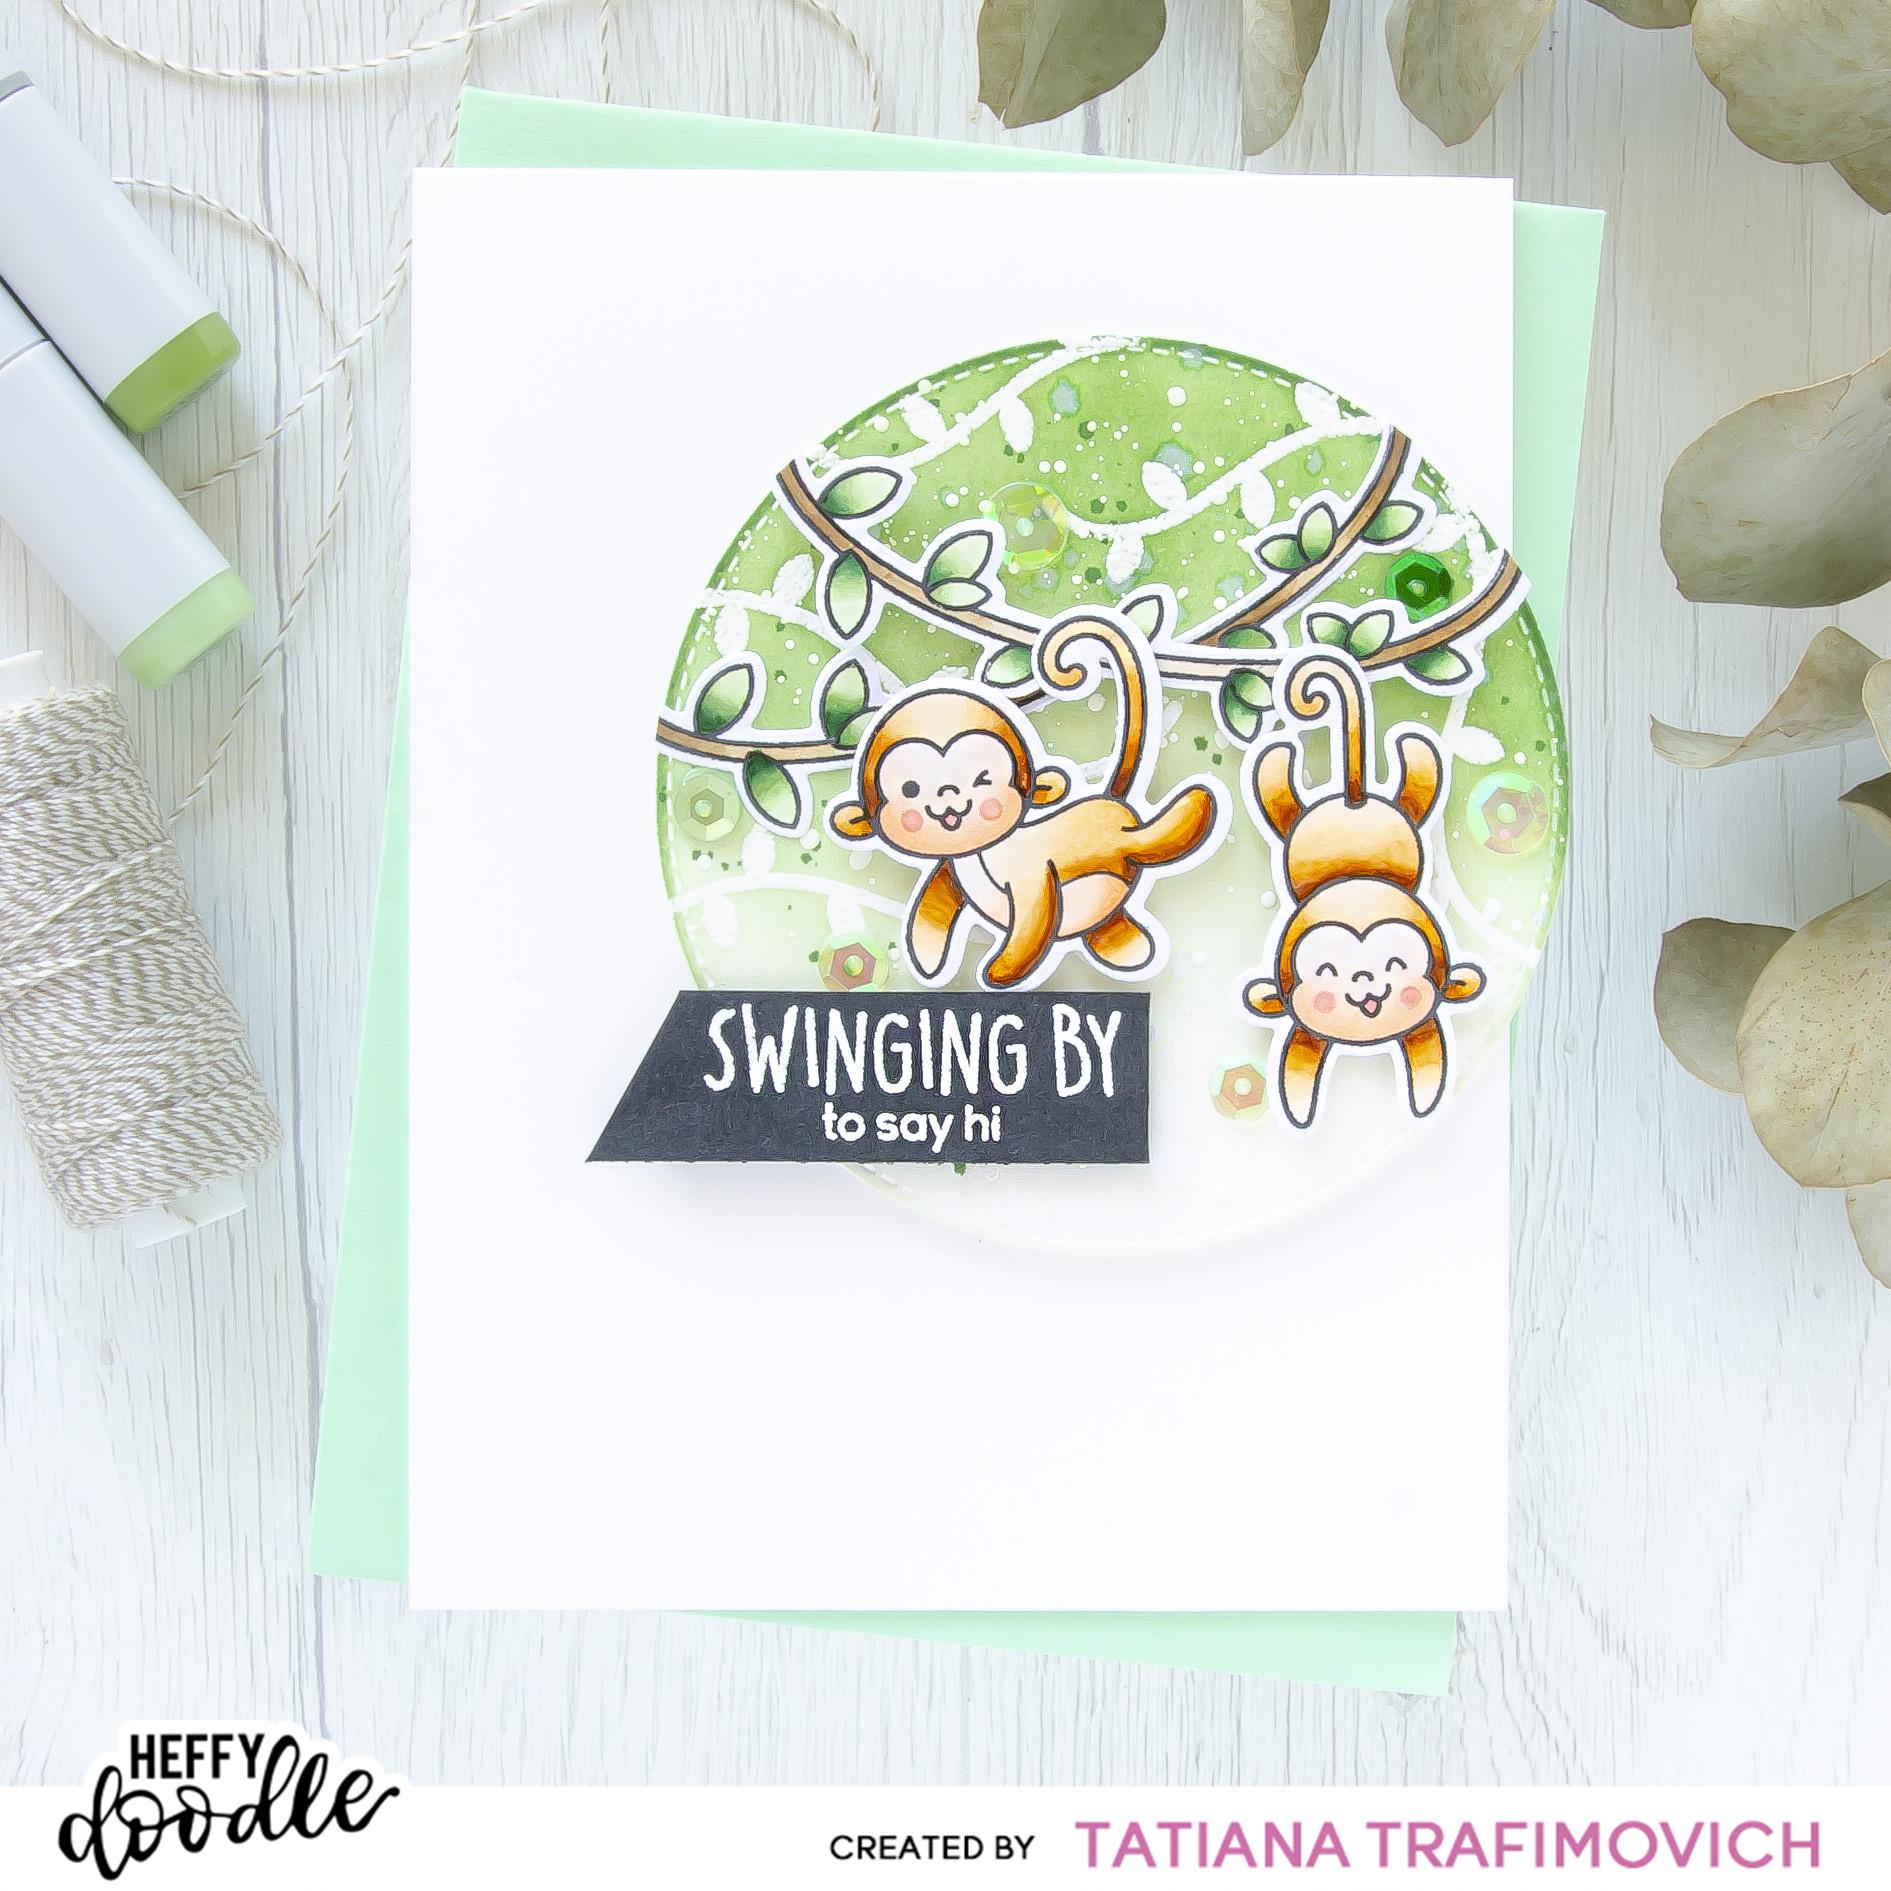 Swinging By #handmade card by Tatiana Trafimovich #tatianacraftandart - Chimply The Best stamp set by Heffy Doodle #heffydoodle